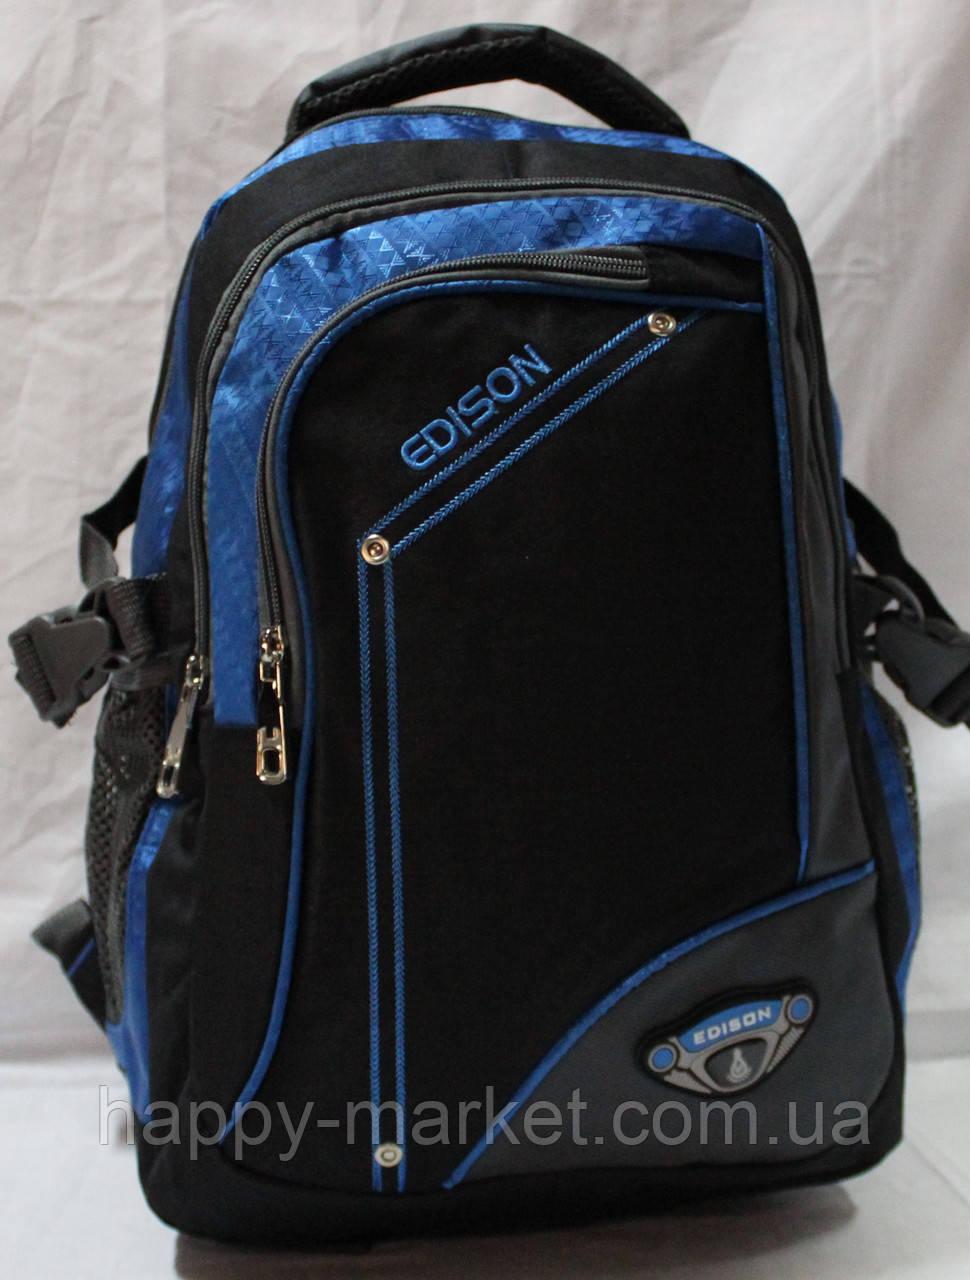 Ранец рюкзак ортопедический EDISON Sport 17-7840-2